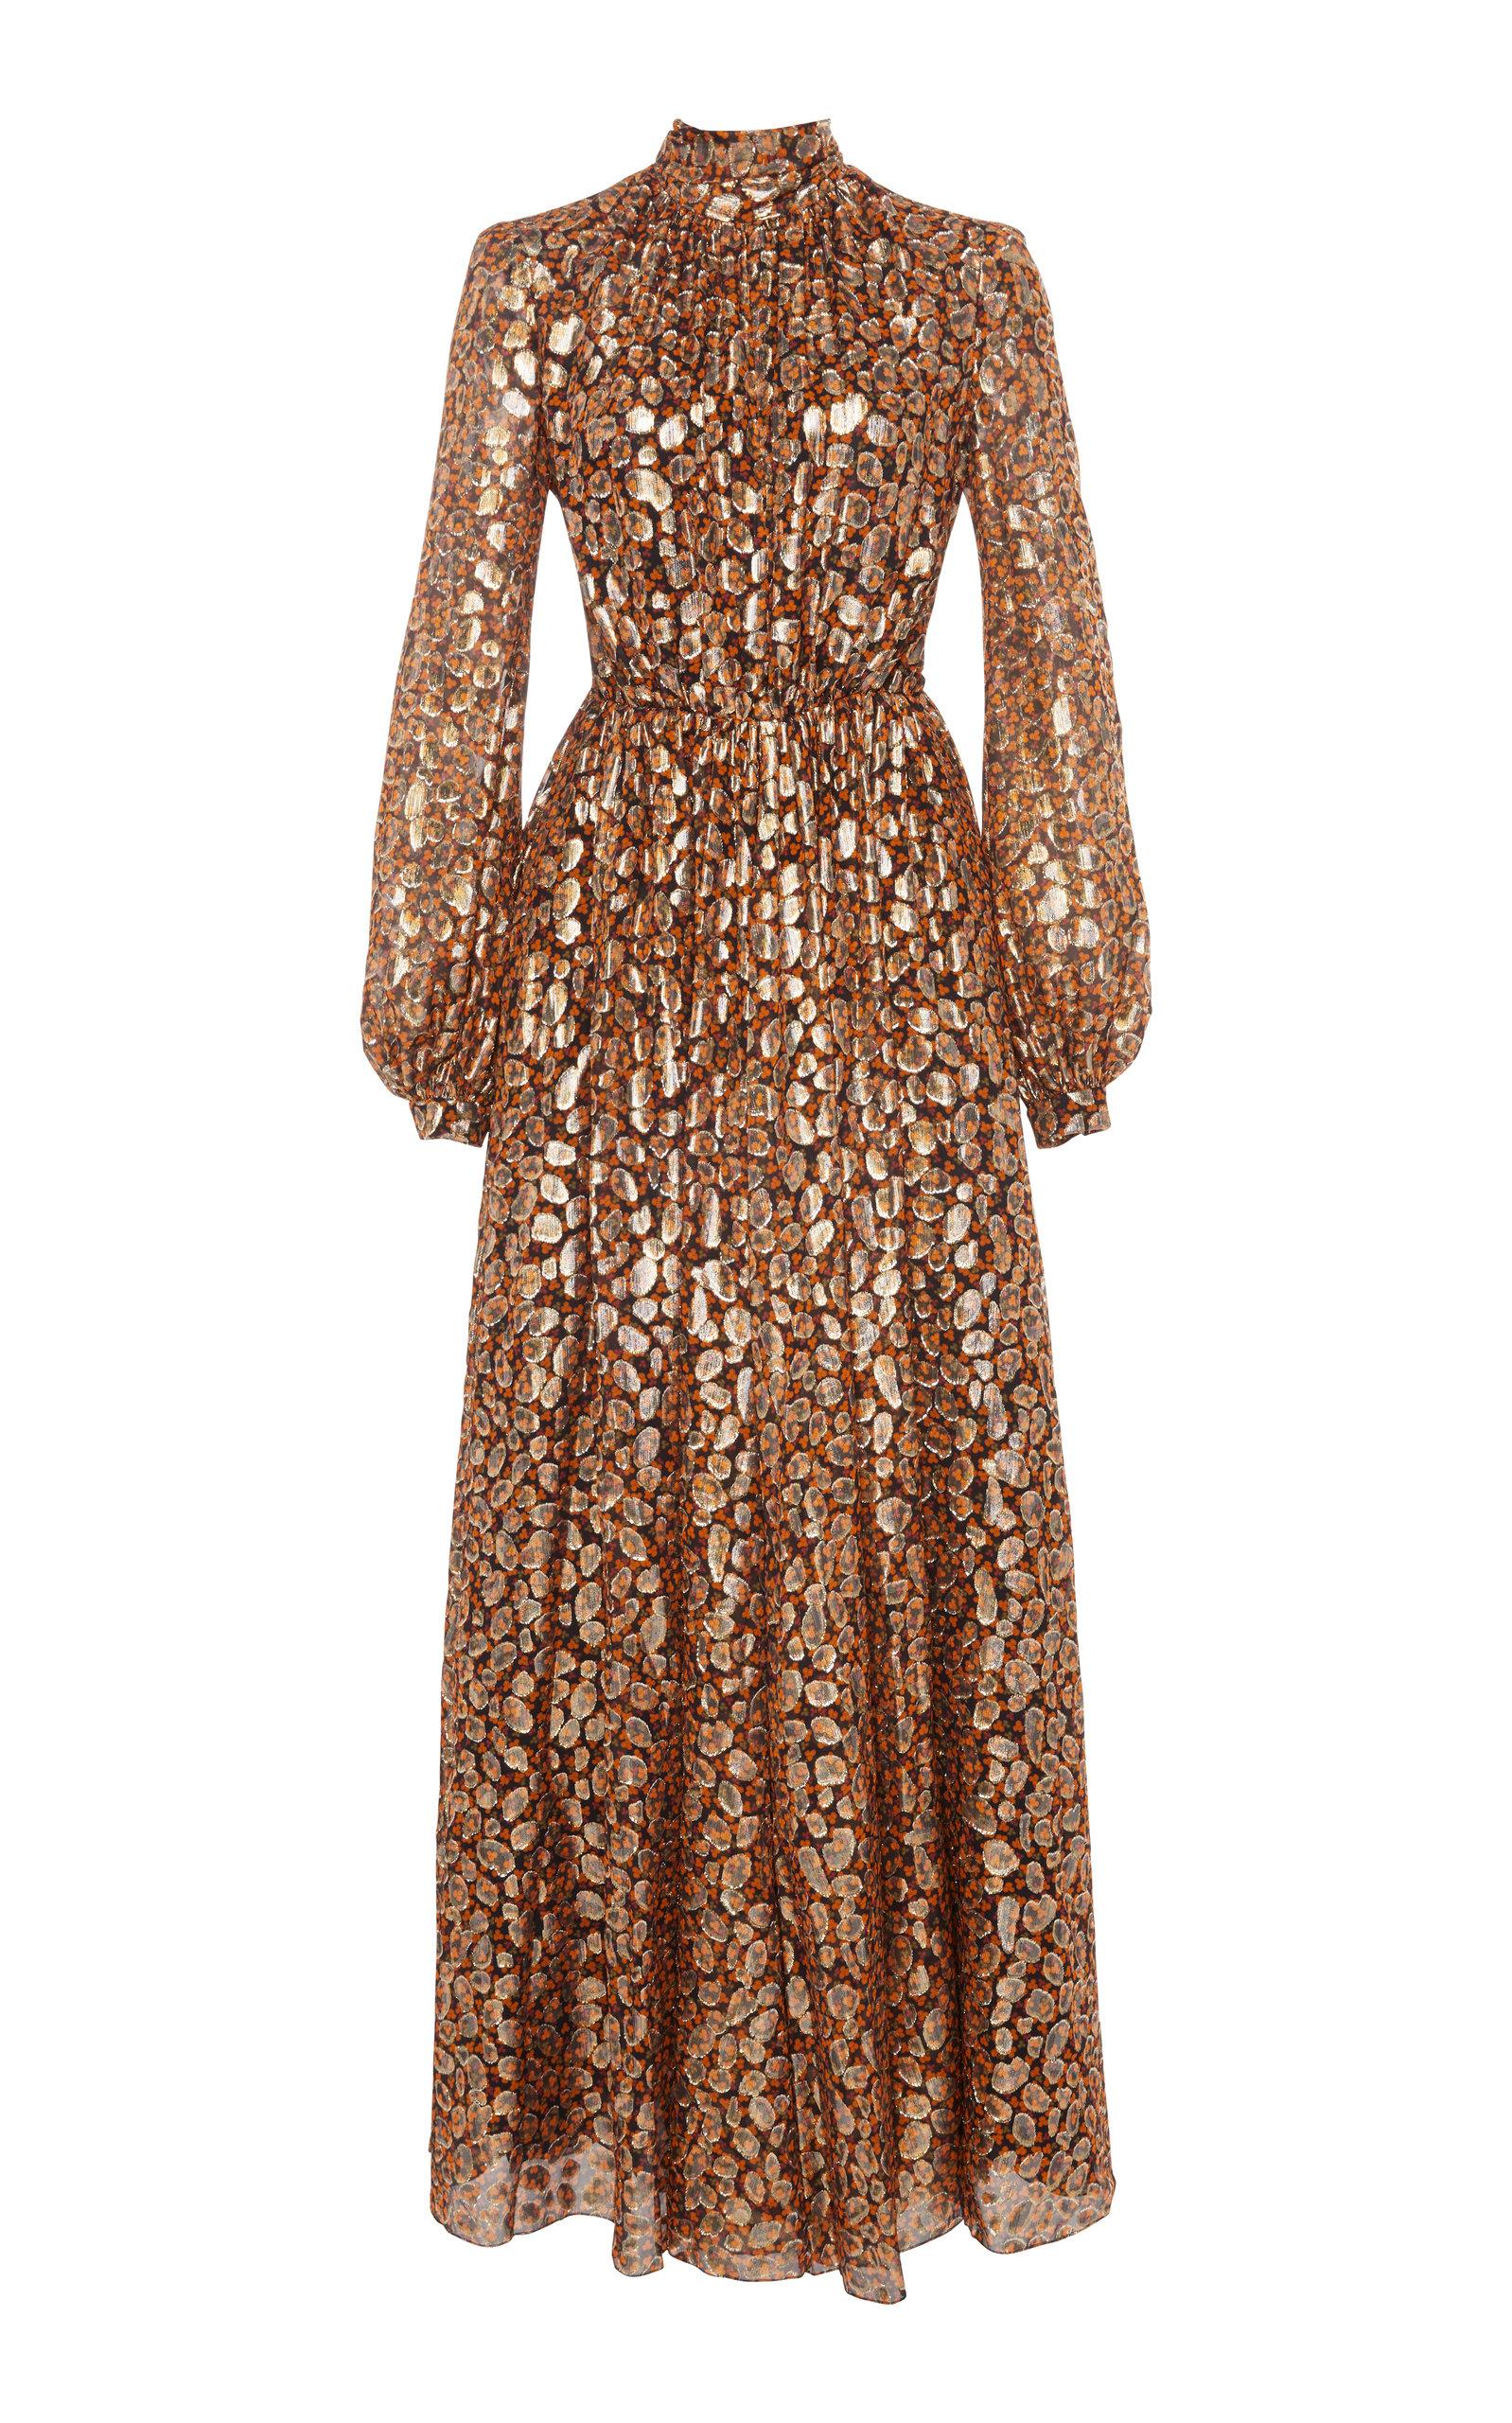 1093833d Giambattista ValliFloral Metallic Silk-Blend Maxi Dress. CLOSE. Loading